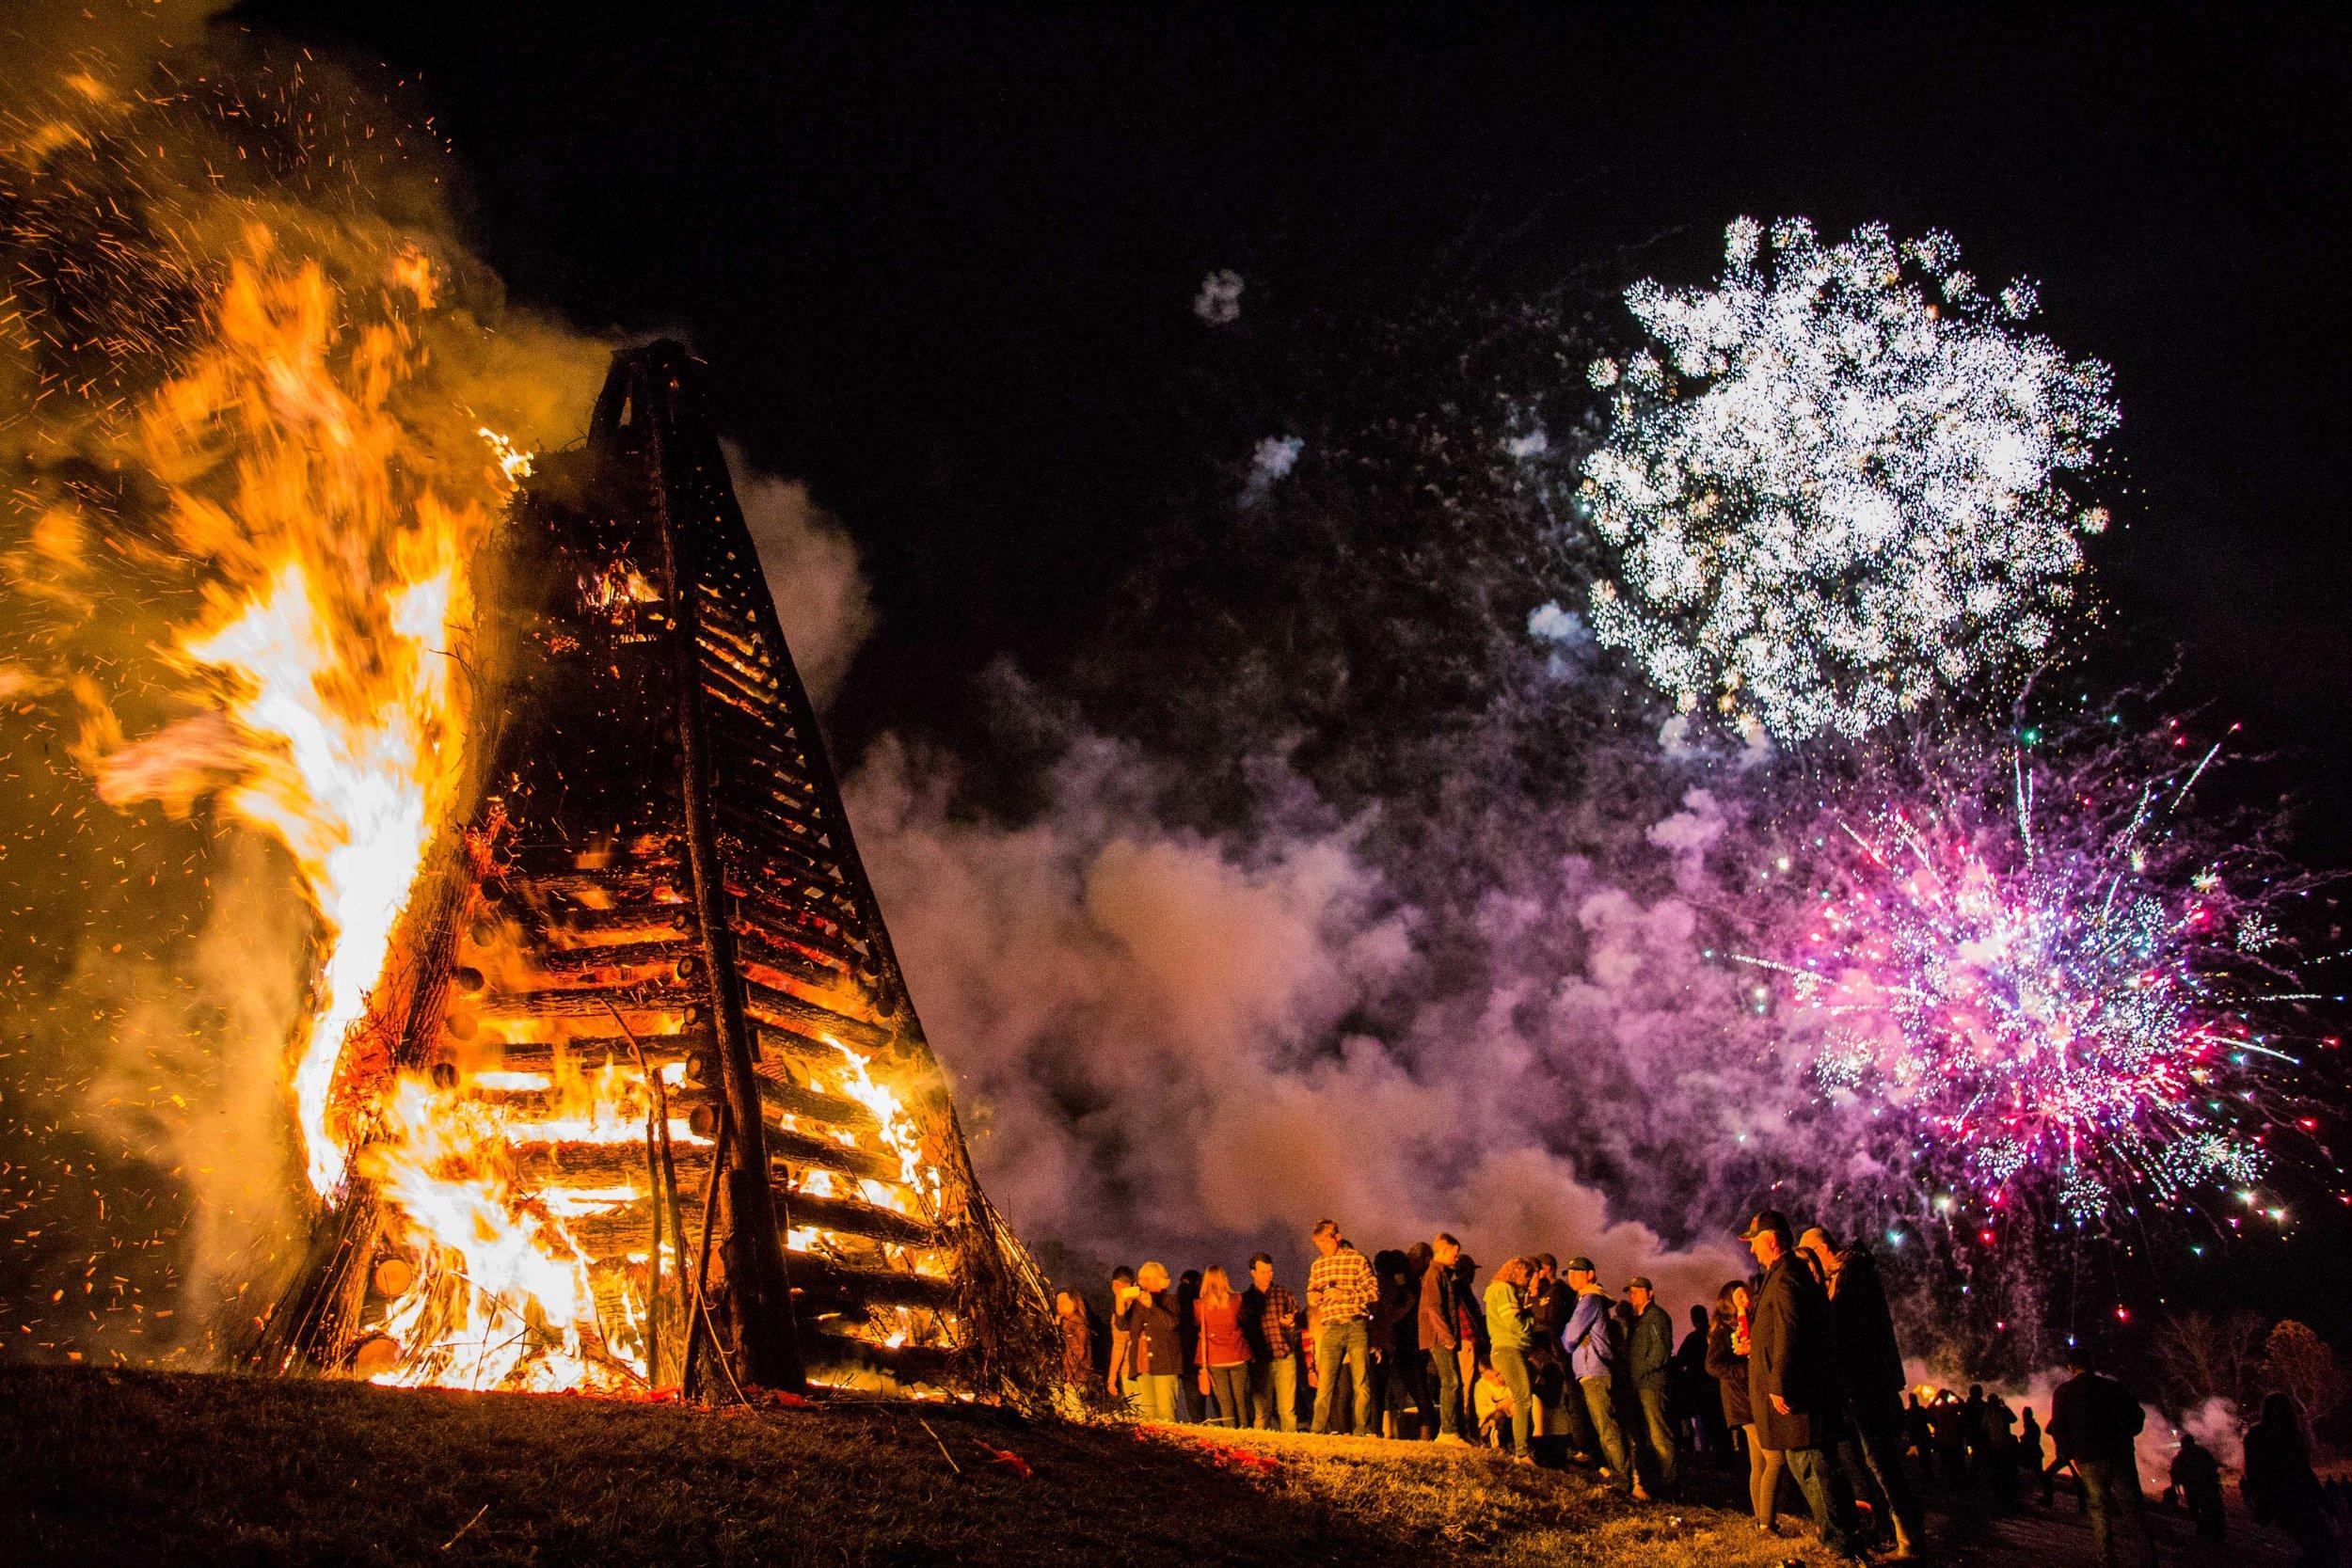 Louisiana New Year's bonfires to welcome Papa Noel